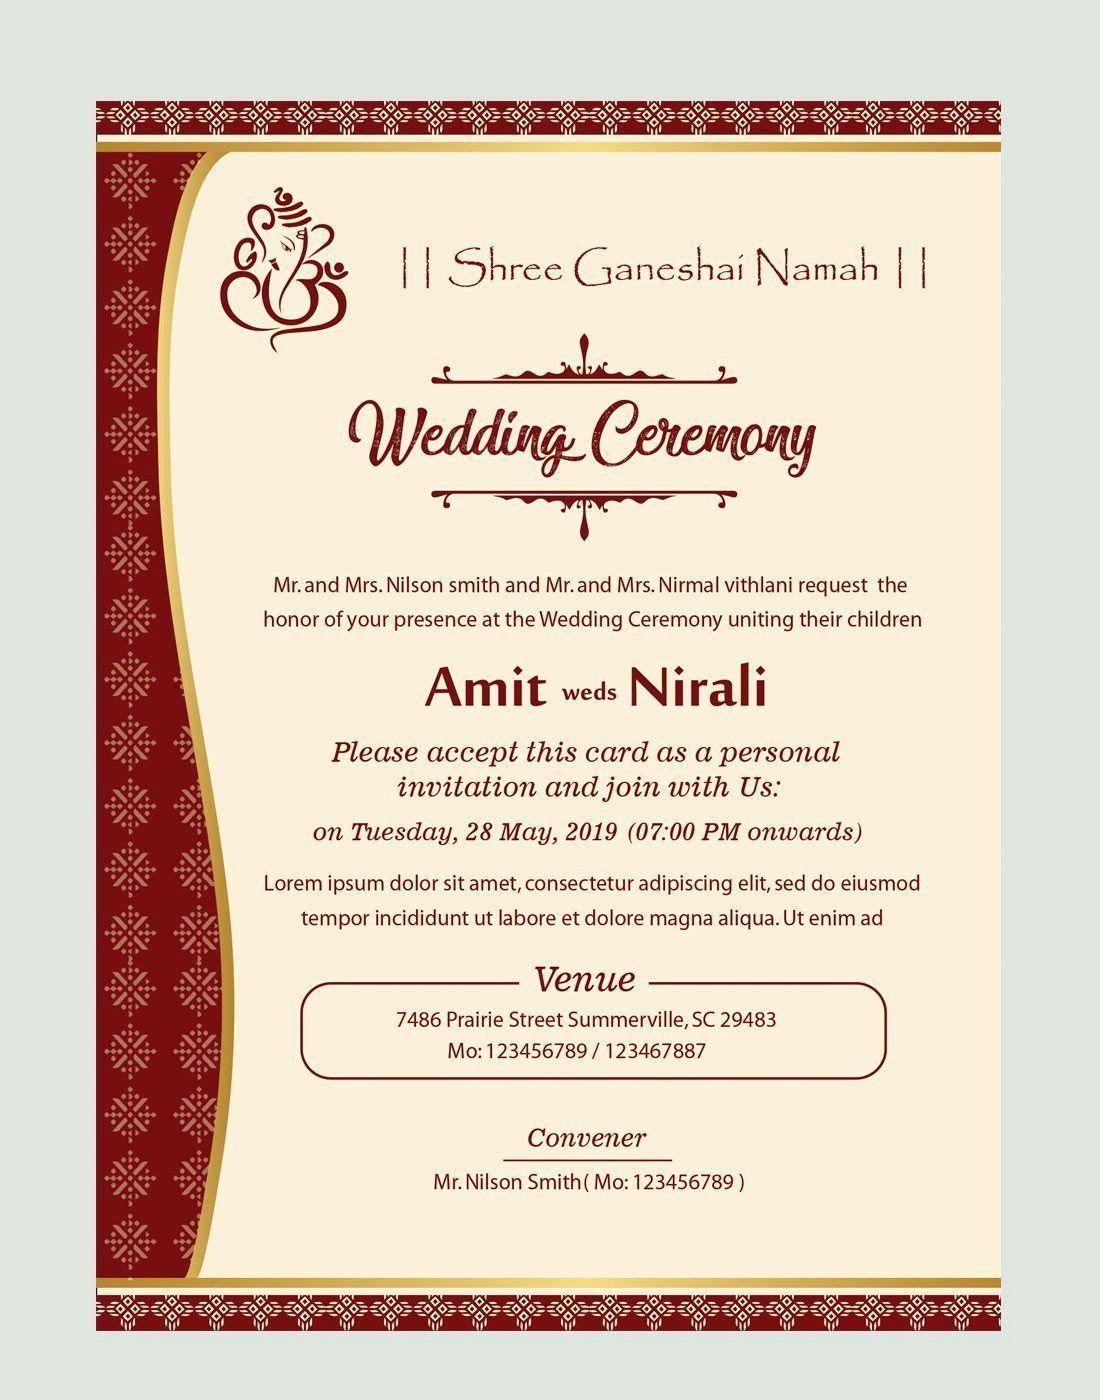 Microsoft Publisher Wedding Invitation Template Elegant Free Kankotri Card Templat In 2020 Fun Wedding Invitations Wedding Invitation Card Template Wedding Invitations